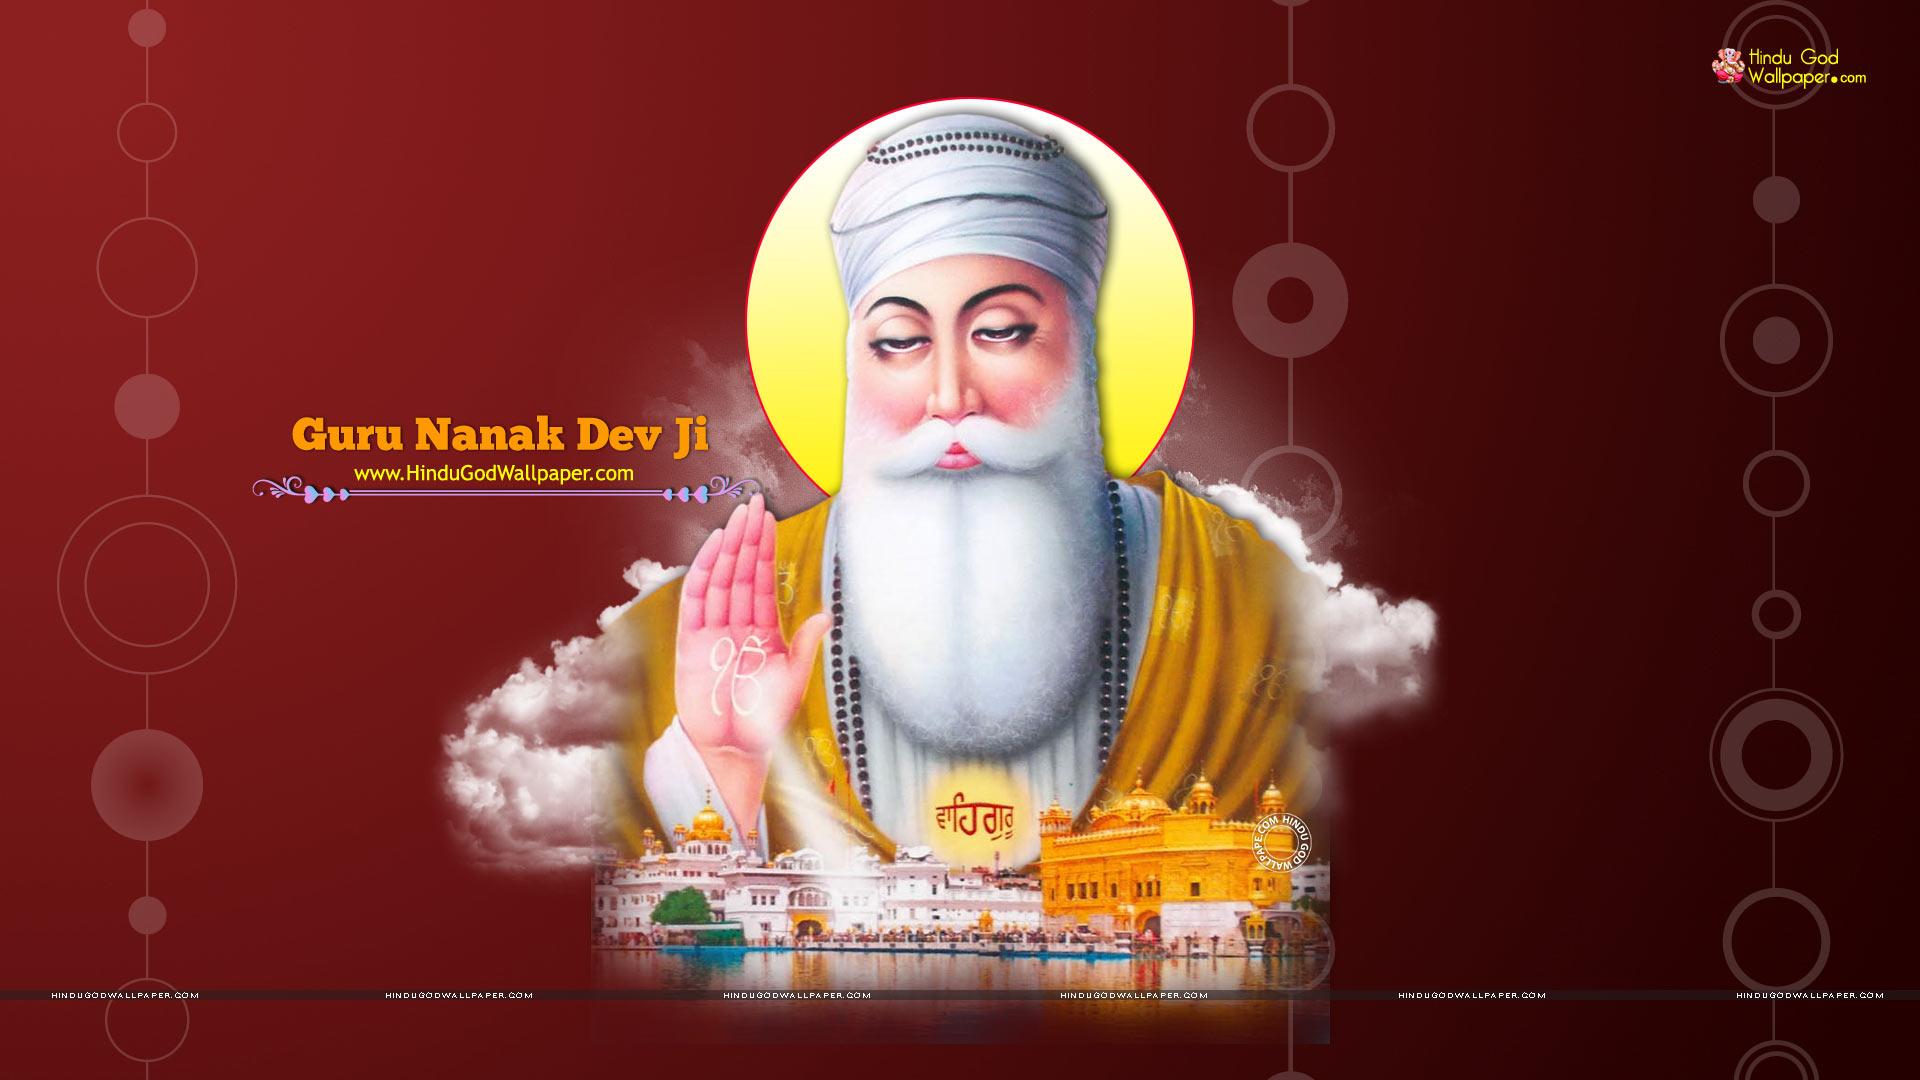 Free download guru nanak dev ji hd wallpaper #44.